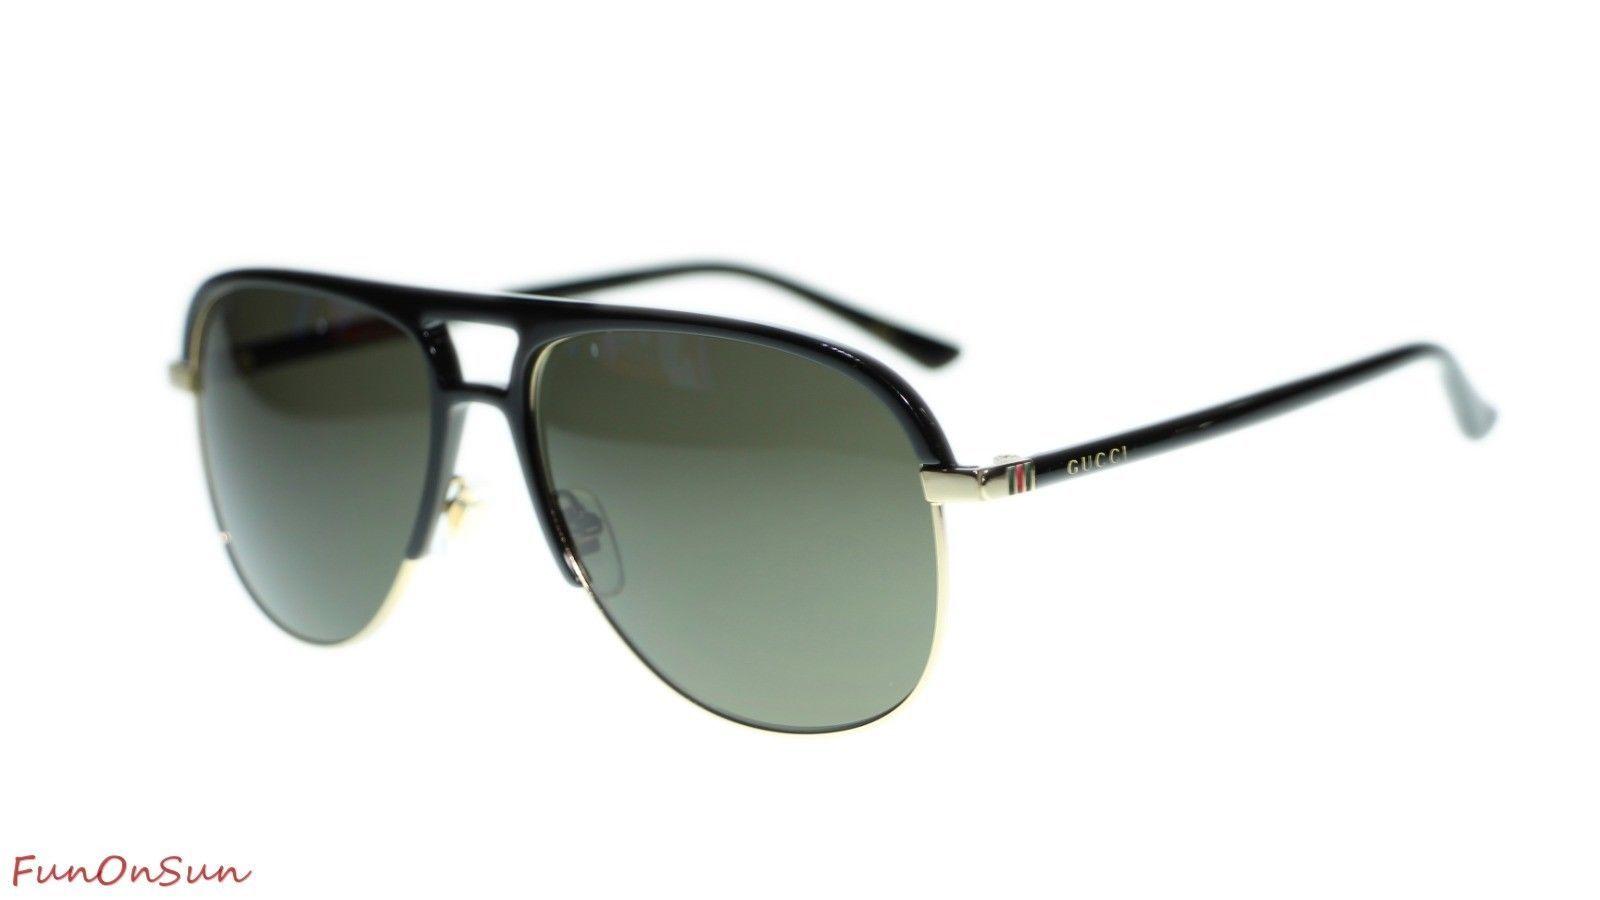 b00524fb1c NEW Gucci Men s Sunglasses GG0292S 001 Black and 47 similar items. 10